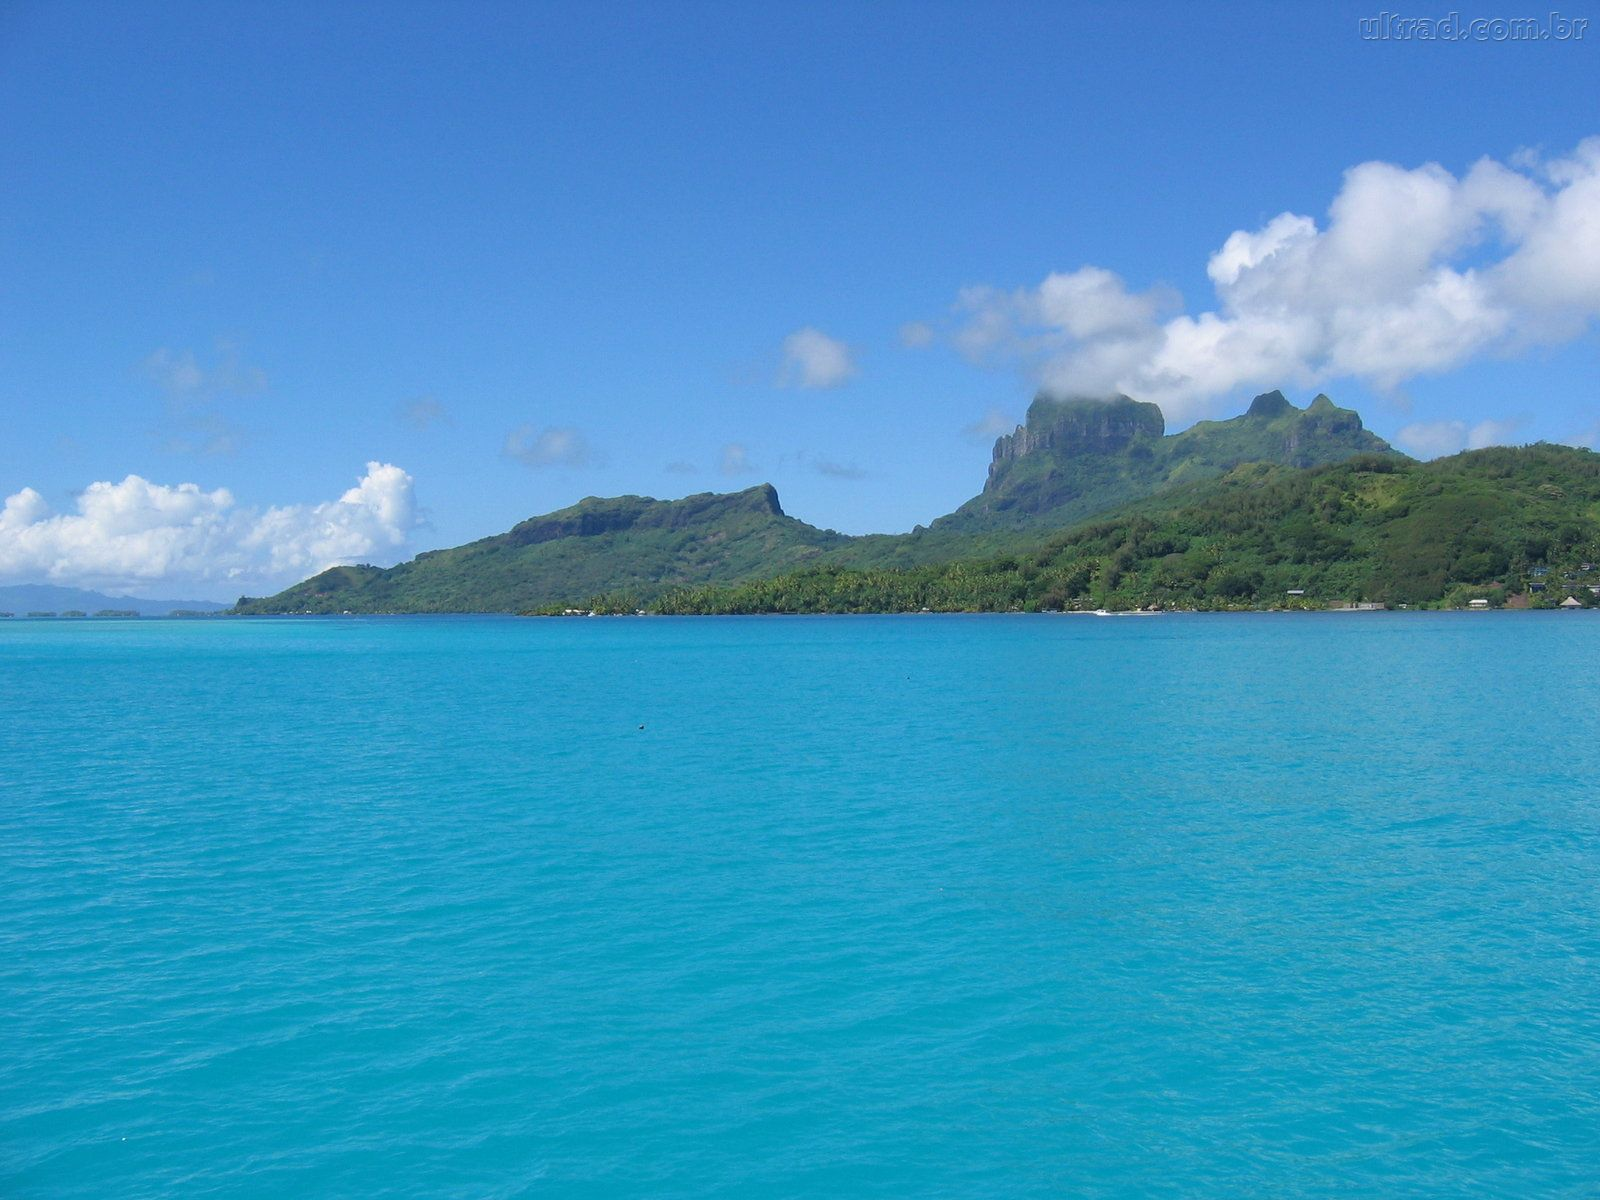 Bora Bora Wallpaper Tahiti - WallpaperSafari